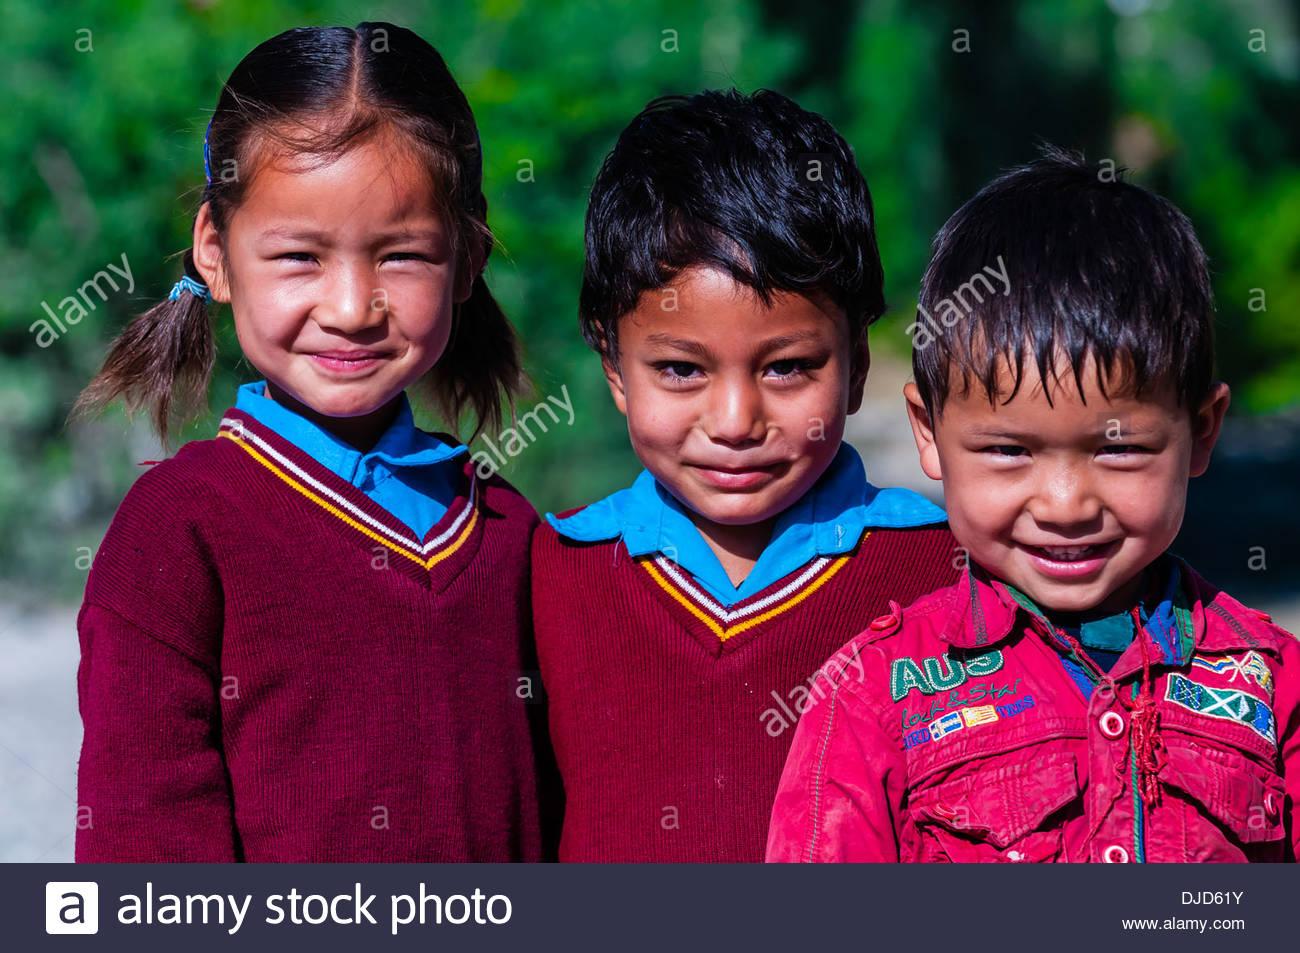 School children; Ladakh, Jammu and Kashmir State, India. - Stock Image